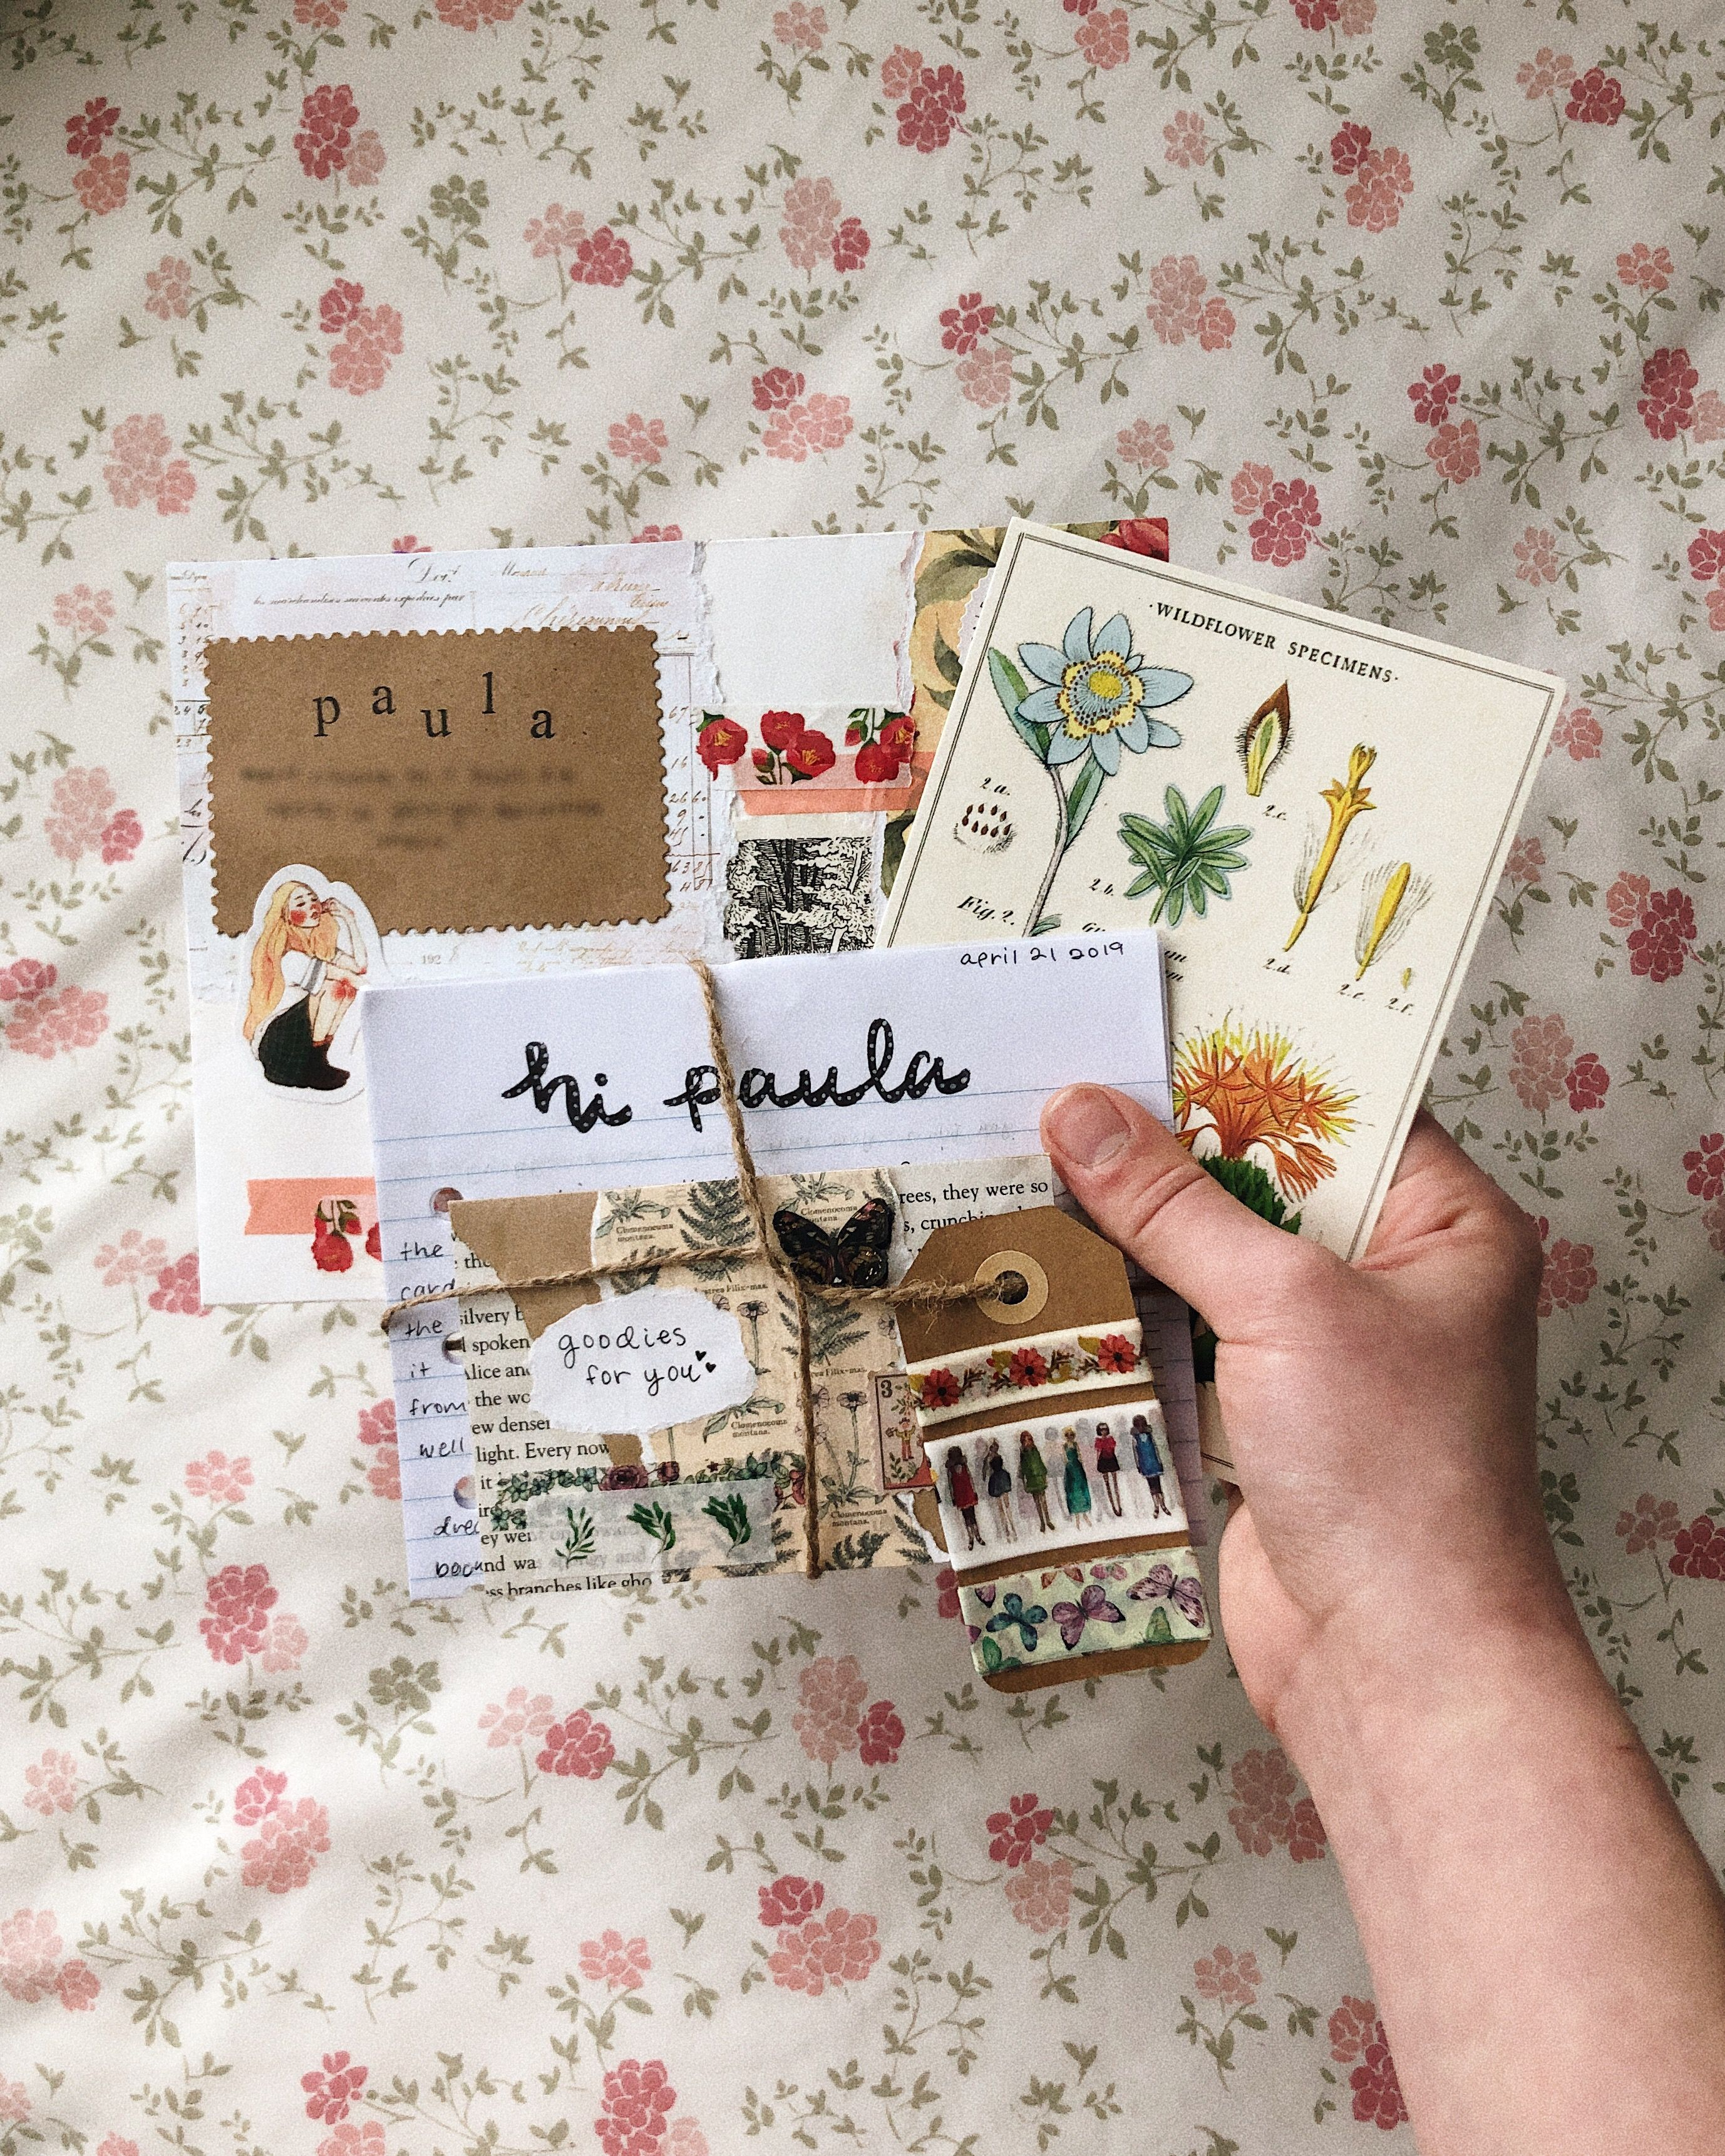 Happy Mail Mini Book for Pen Pal Junk Journal,Scrapbook Mixed Media Collage Paper Ephemera Ephemera Snail Mail Mini Album and Envelope